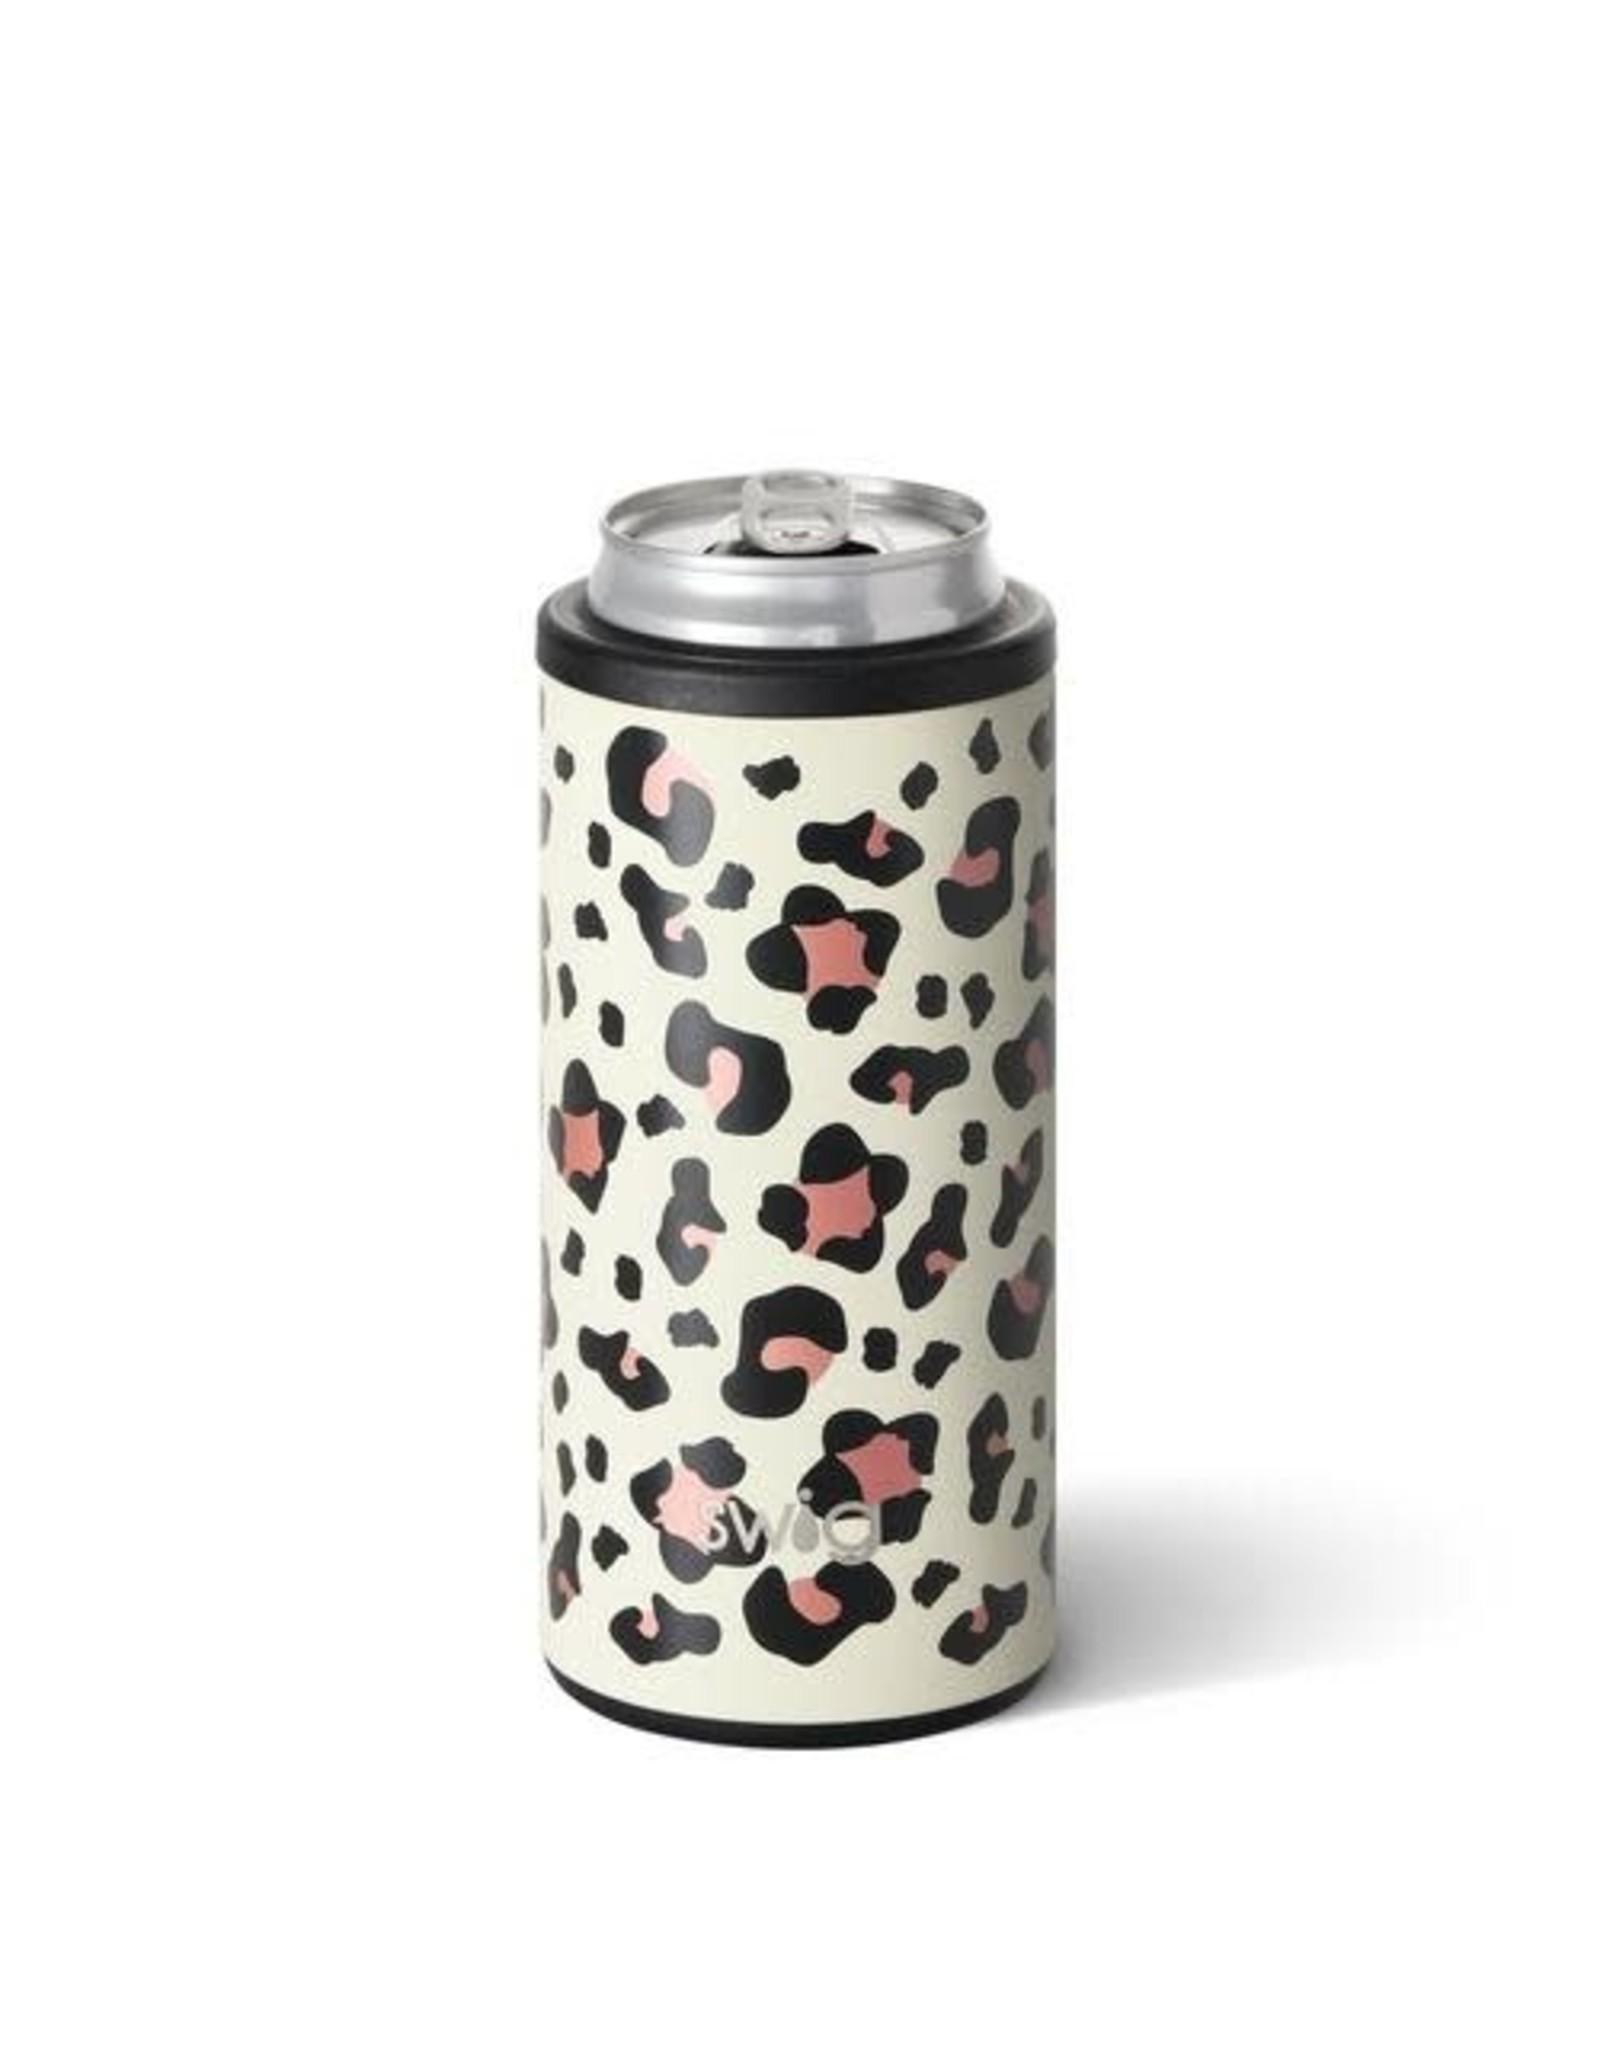 Swig 12 oz Skinny Can Cooler - Luxy Leopard